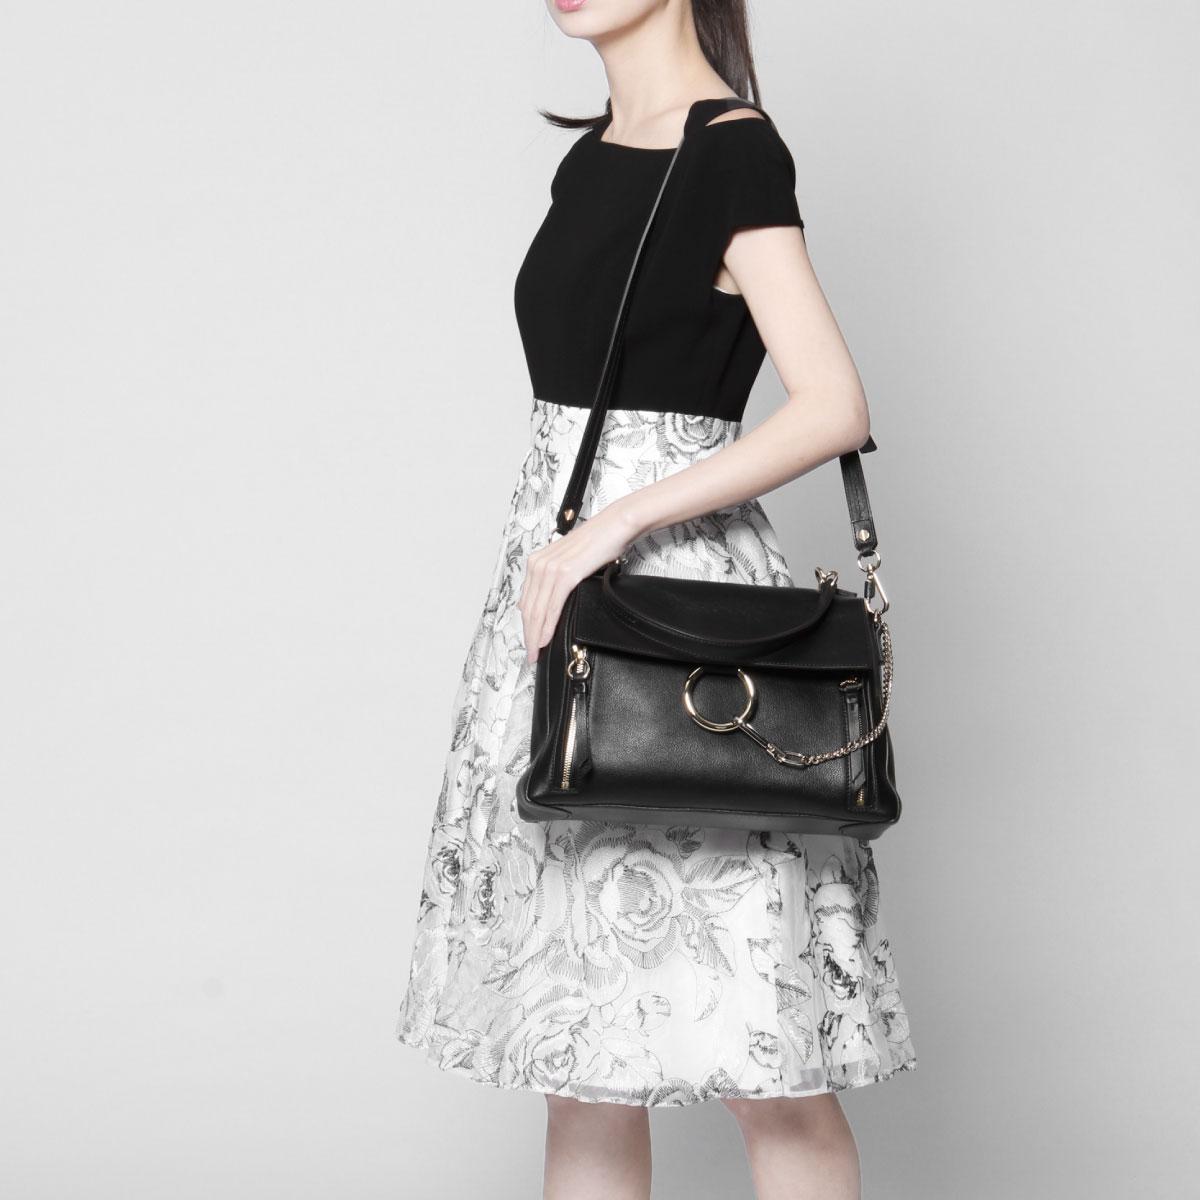 65930b6716 Kuroe CHLOE bag lady C17WS321 HGJ 001 shoulder handbag medium FAYE DAY Fay  D BLACK black belonging to